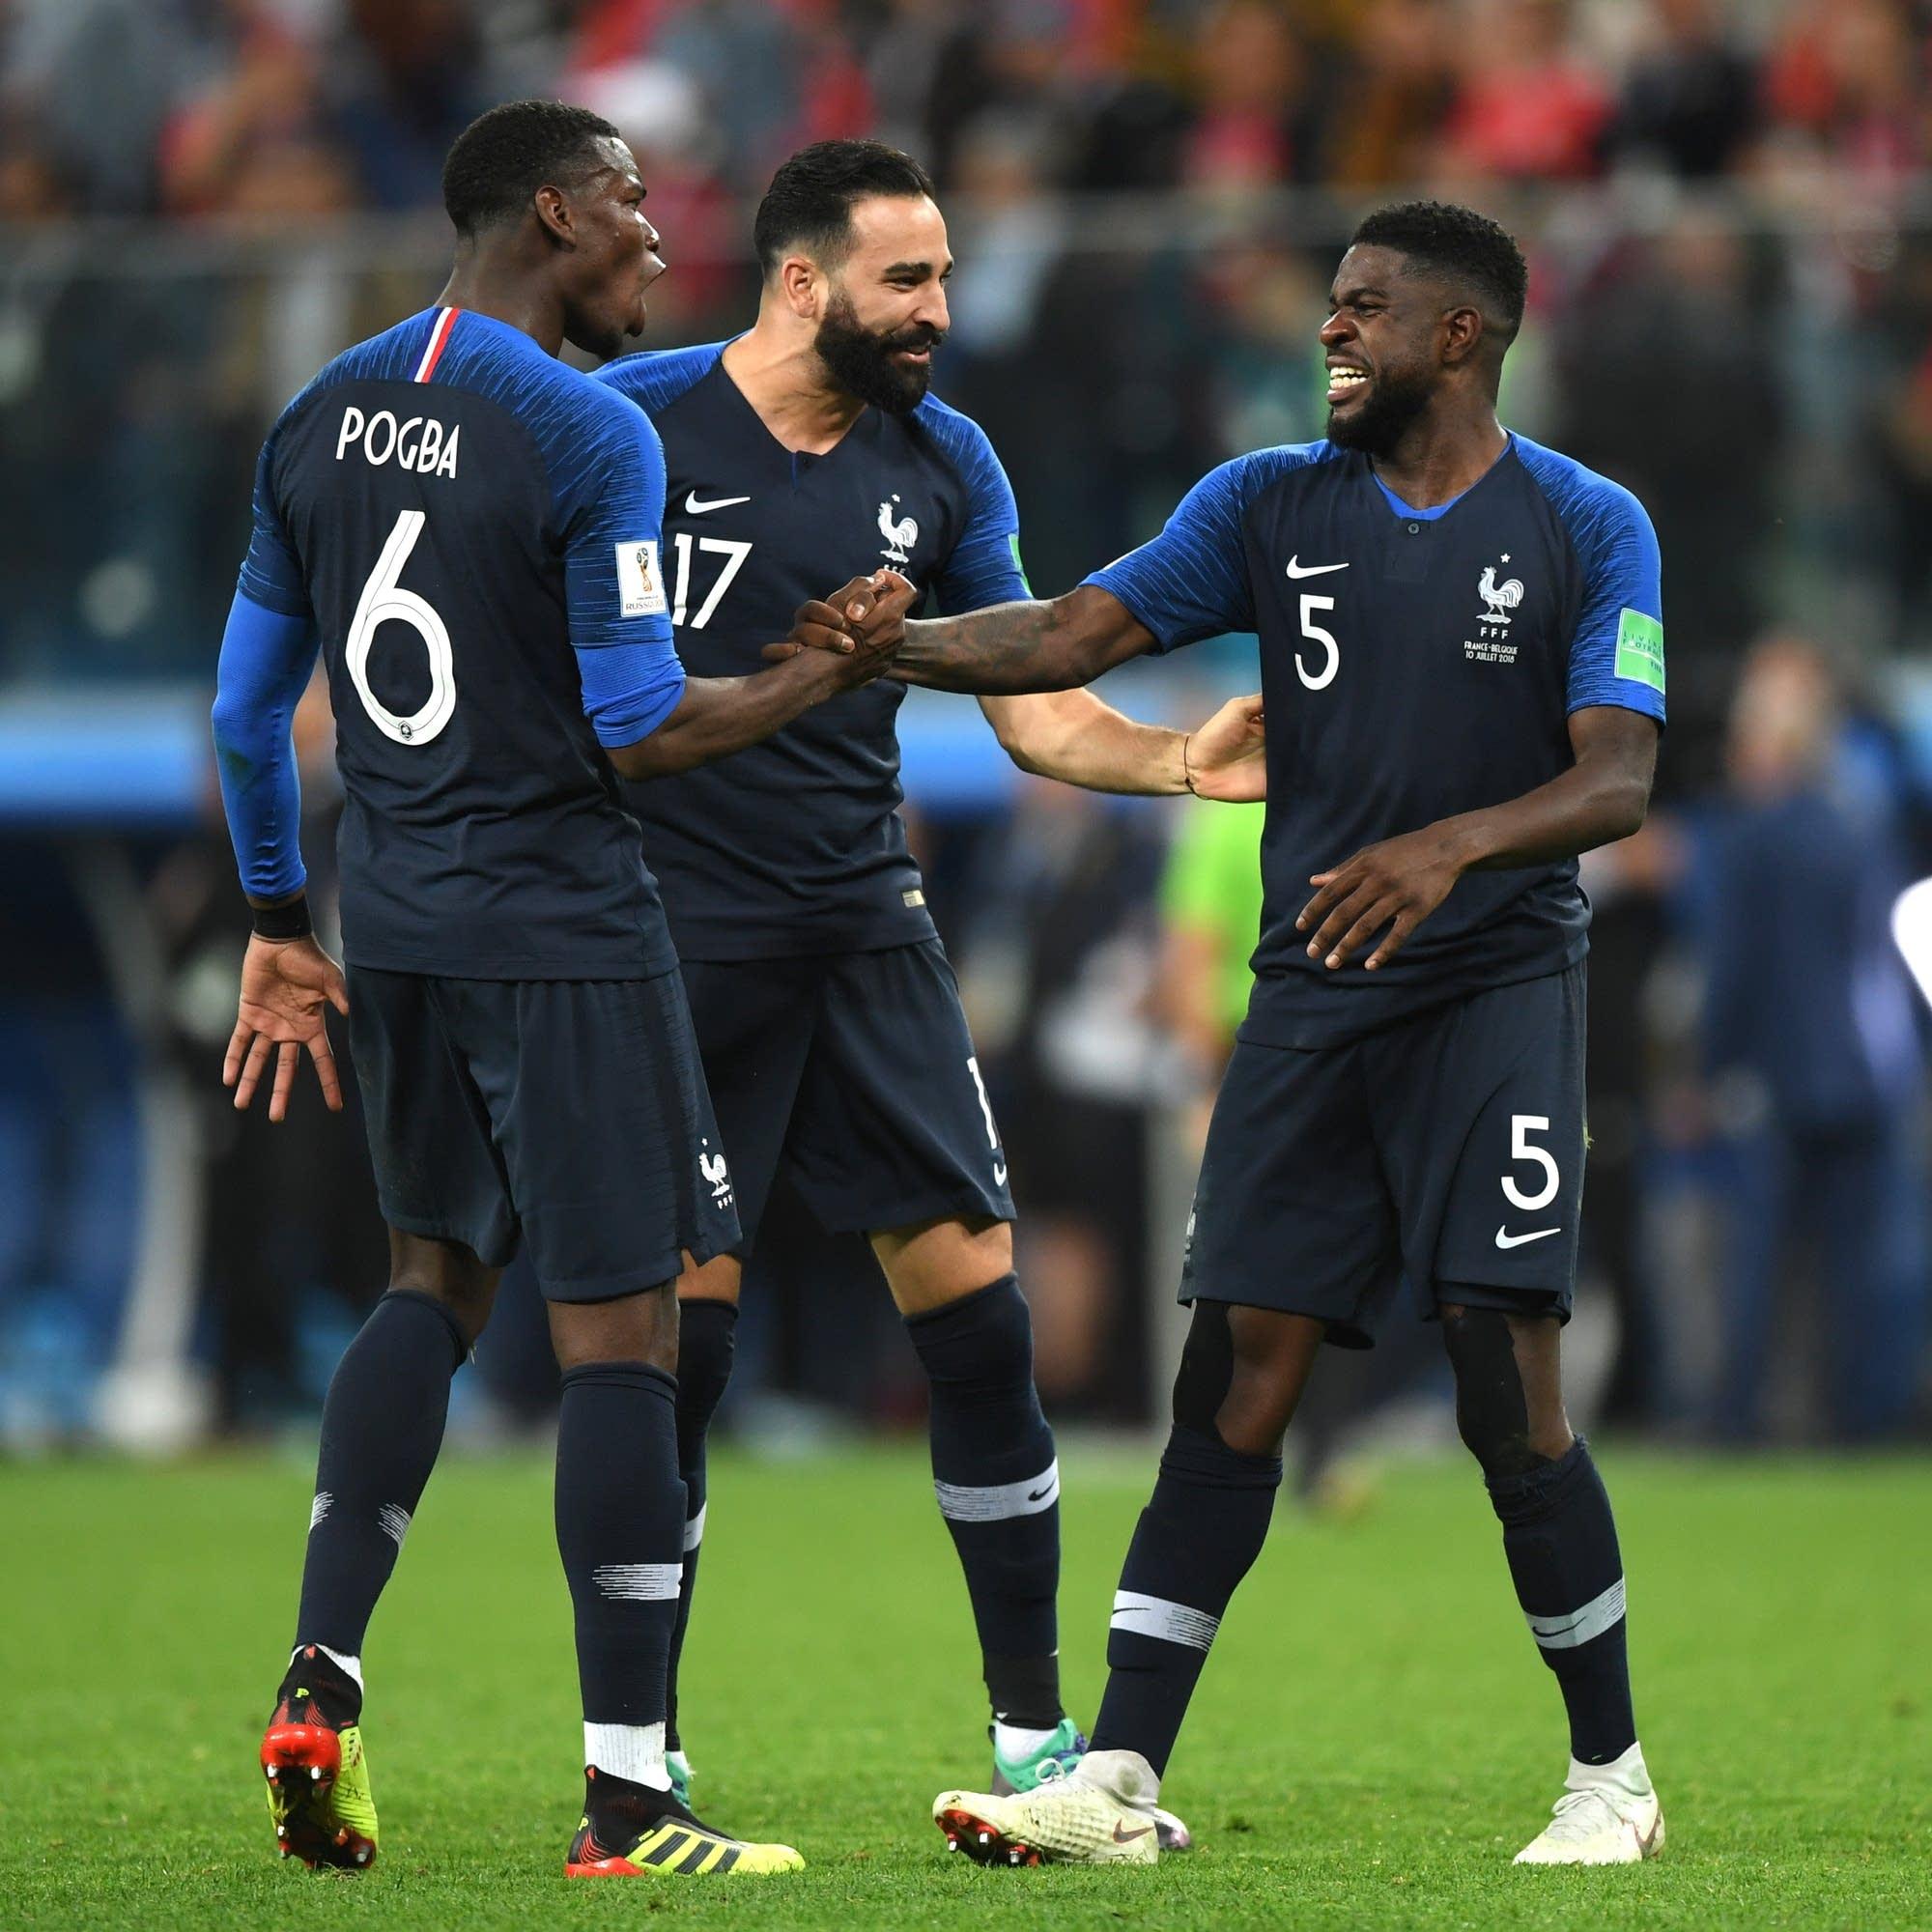 Paul Pogba, Adil Rami and Samuel Umtiti of France celebrate.